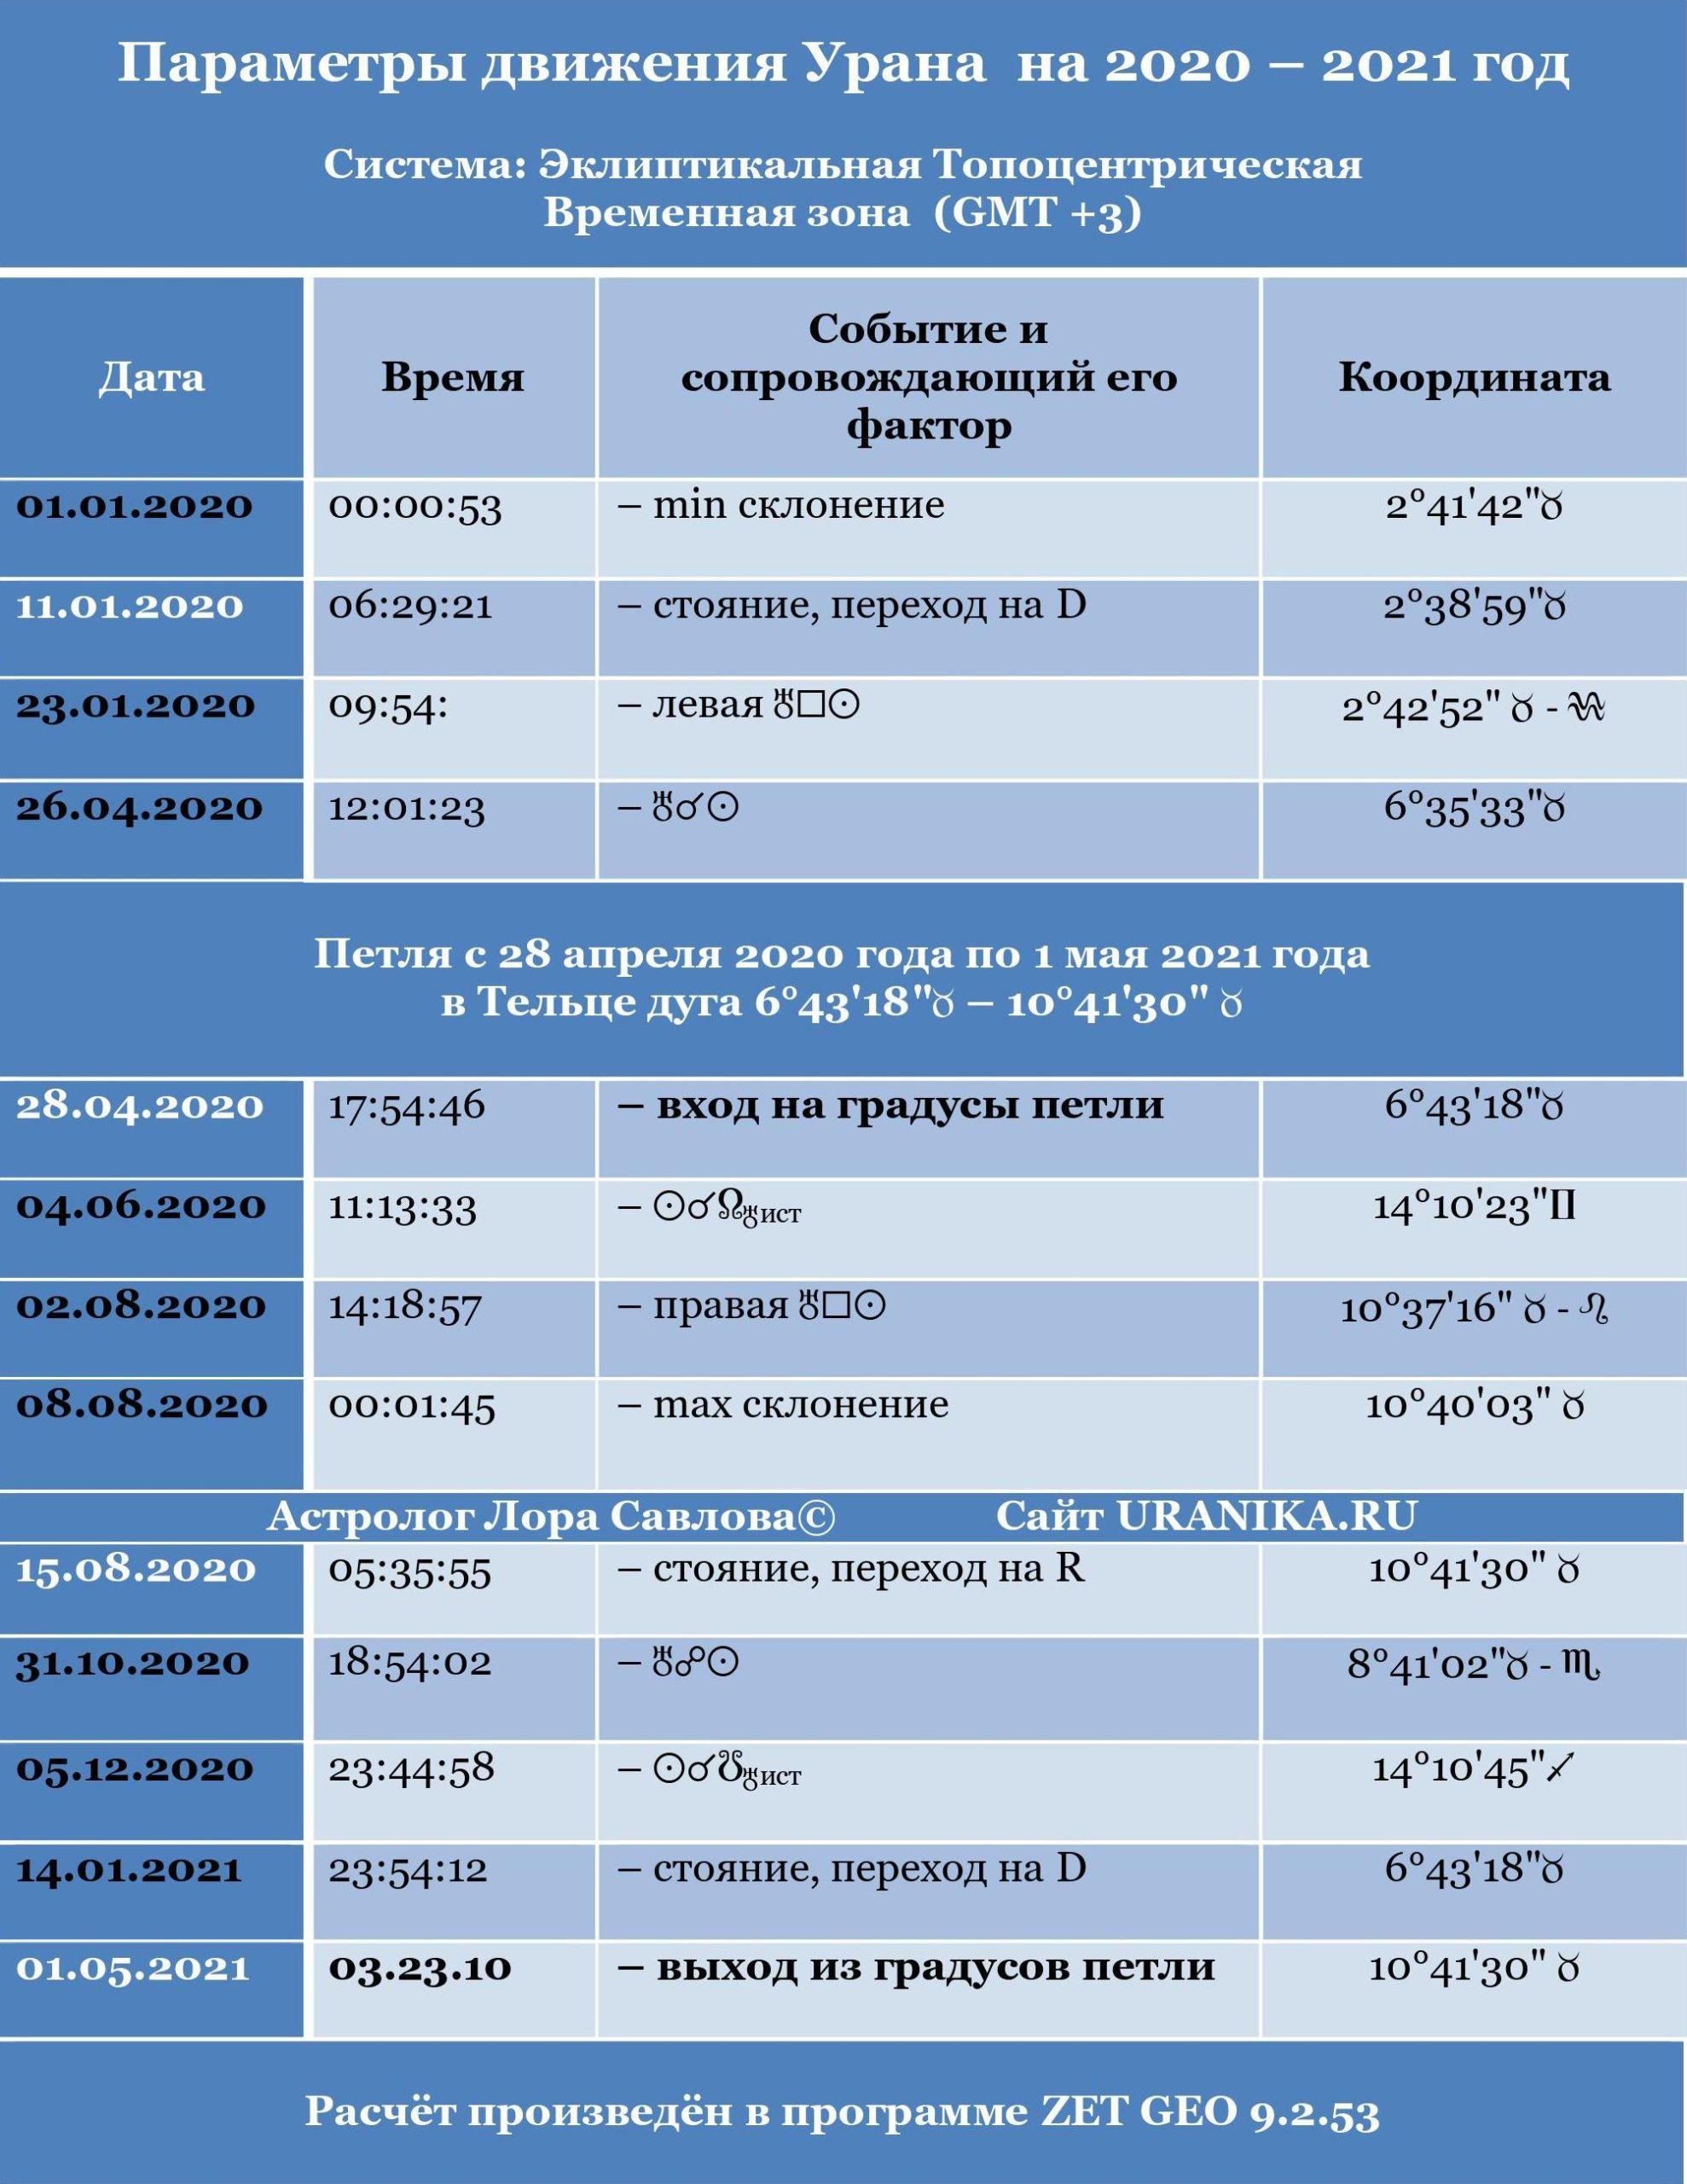 petlja urana 2020 god scaled - Петля Урана на 2020 год